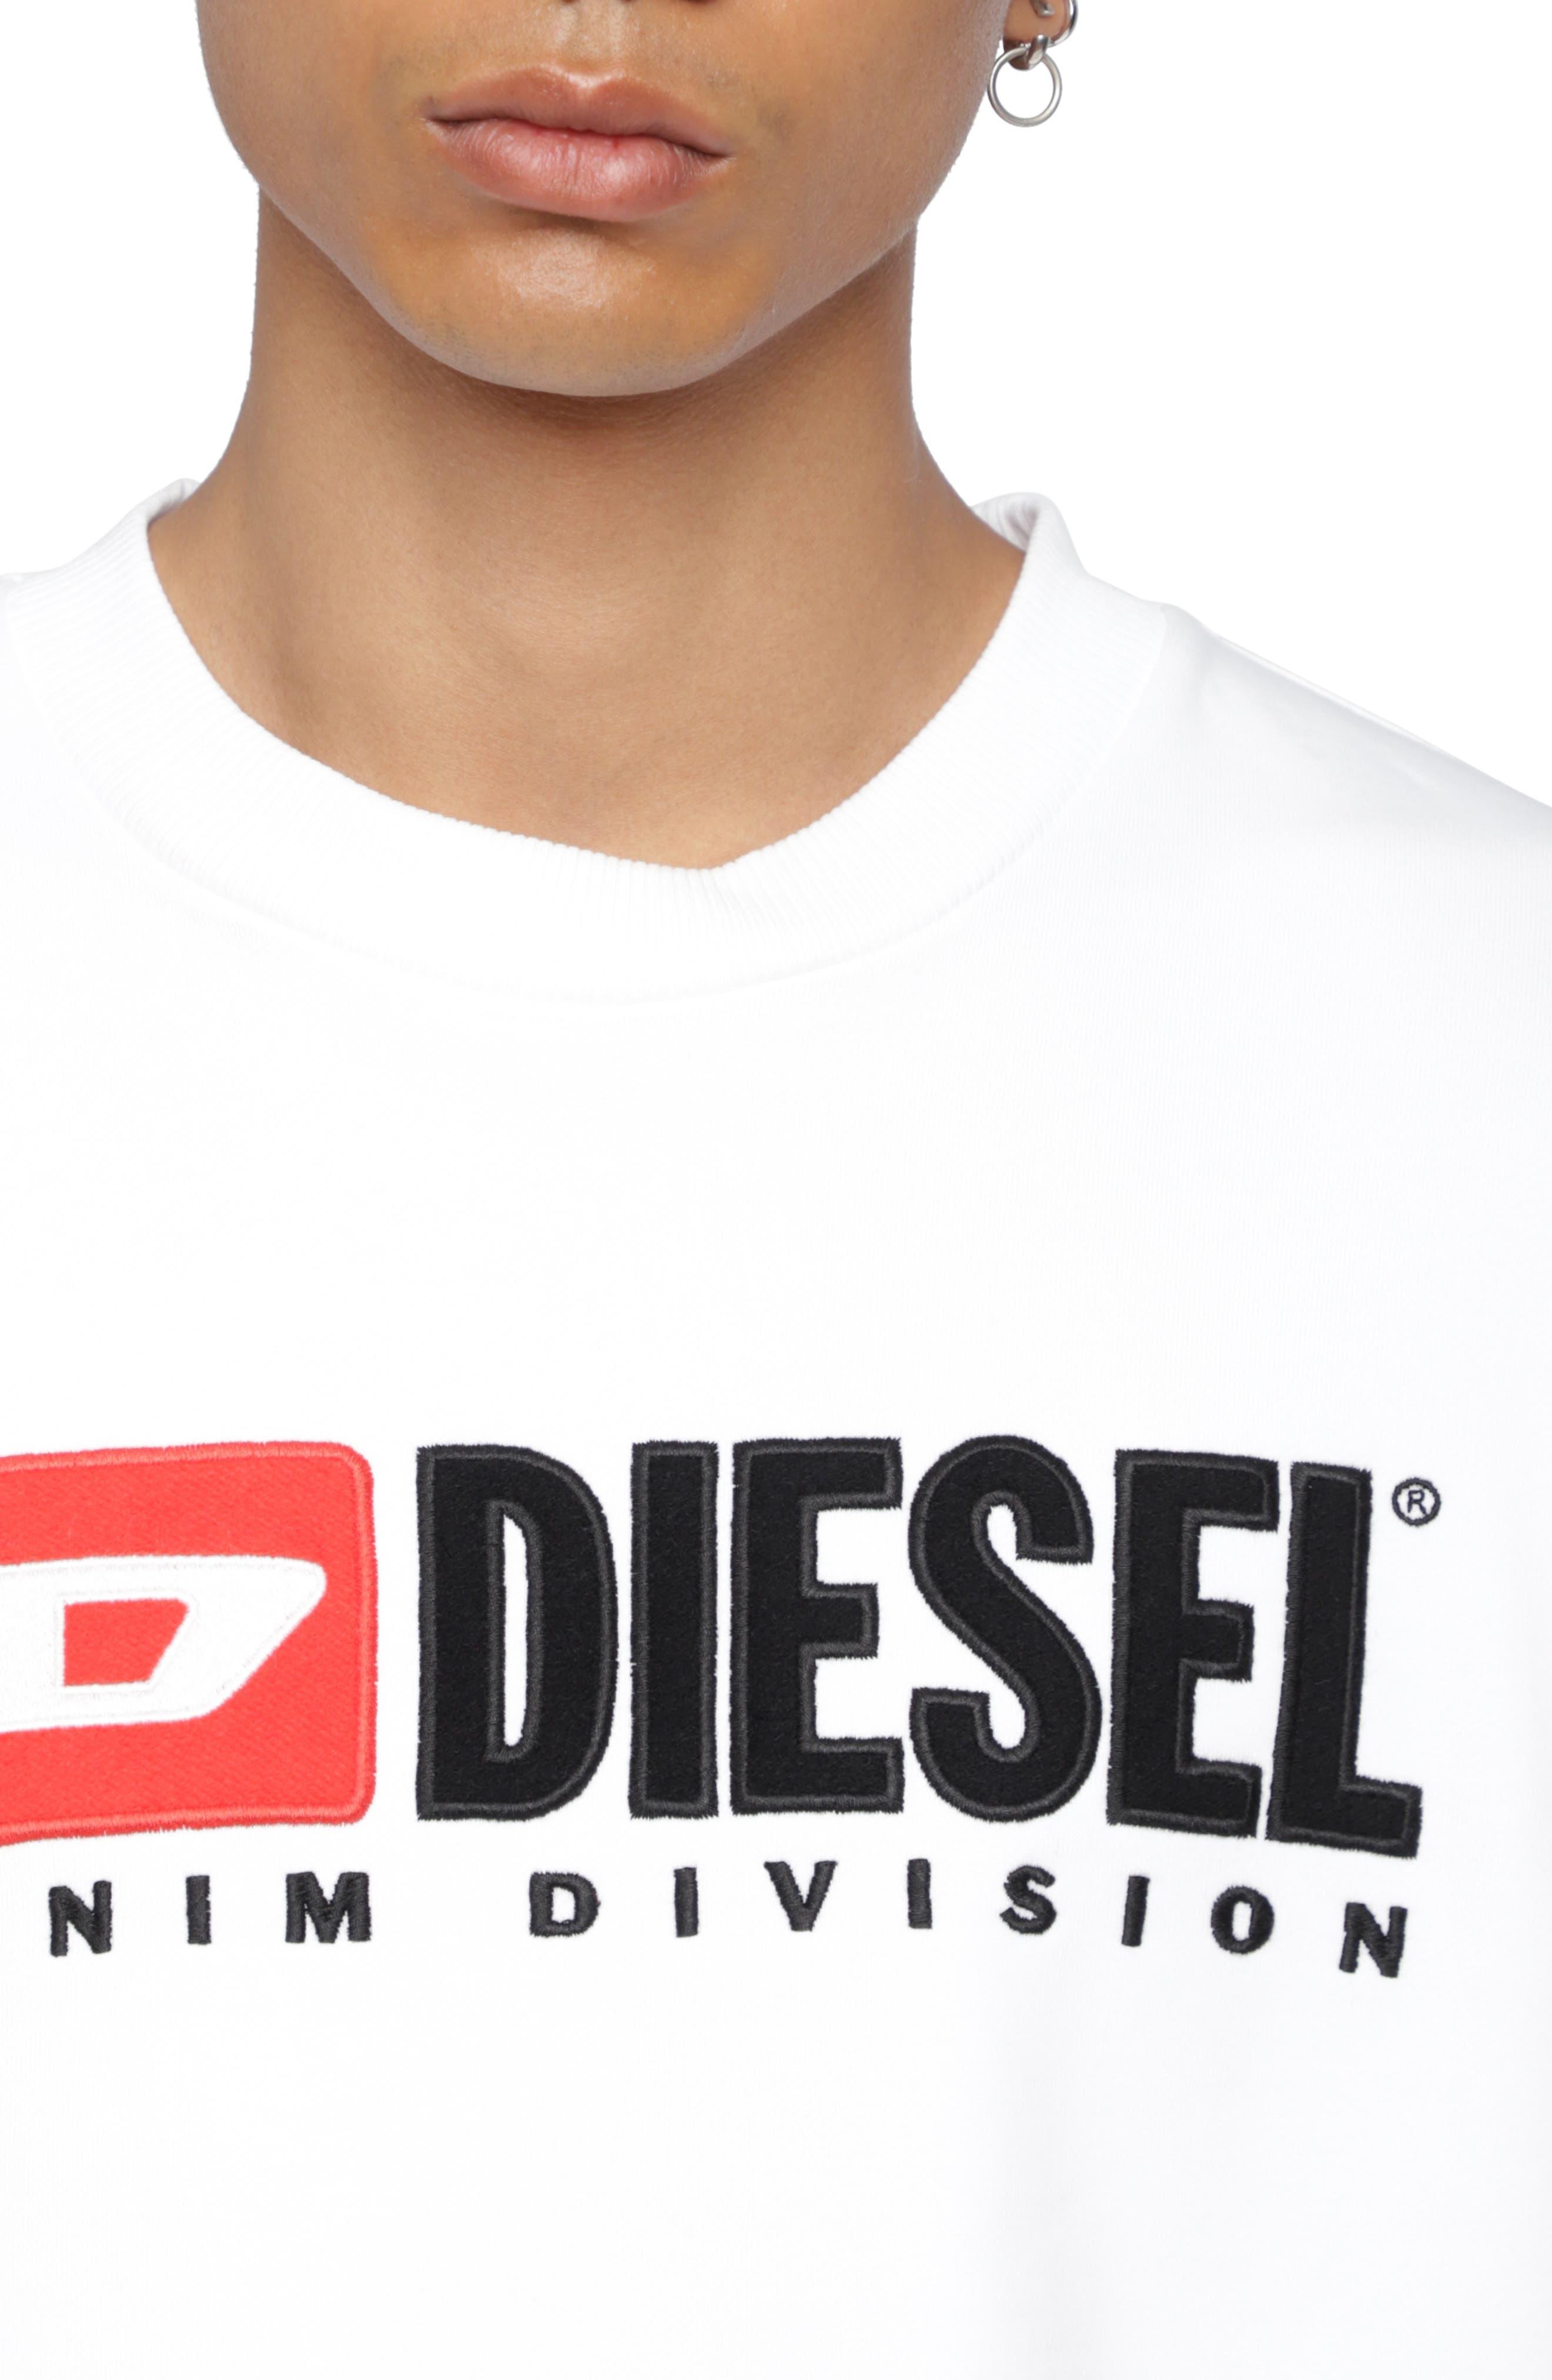 S-CREW-DIVISION Sweatshirt,                             Alternate thumbnail 3, color,                             WHITE